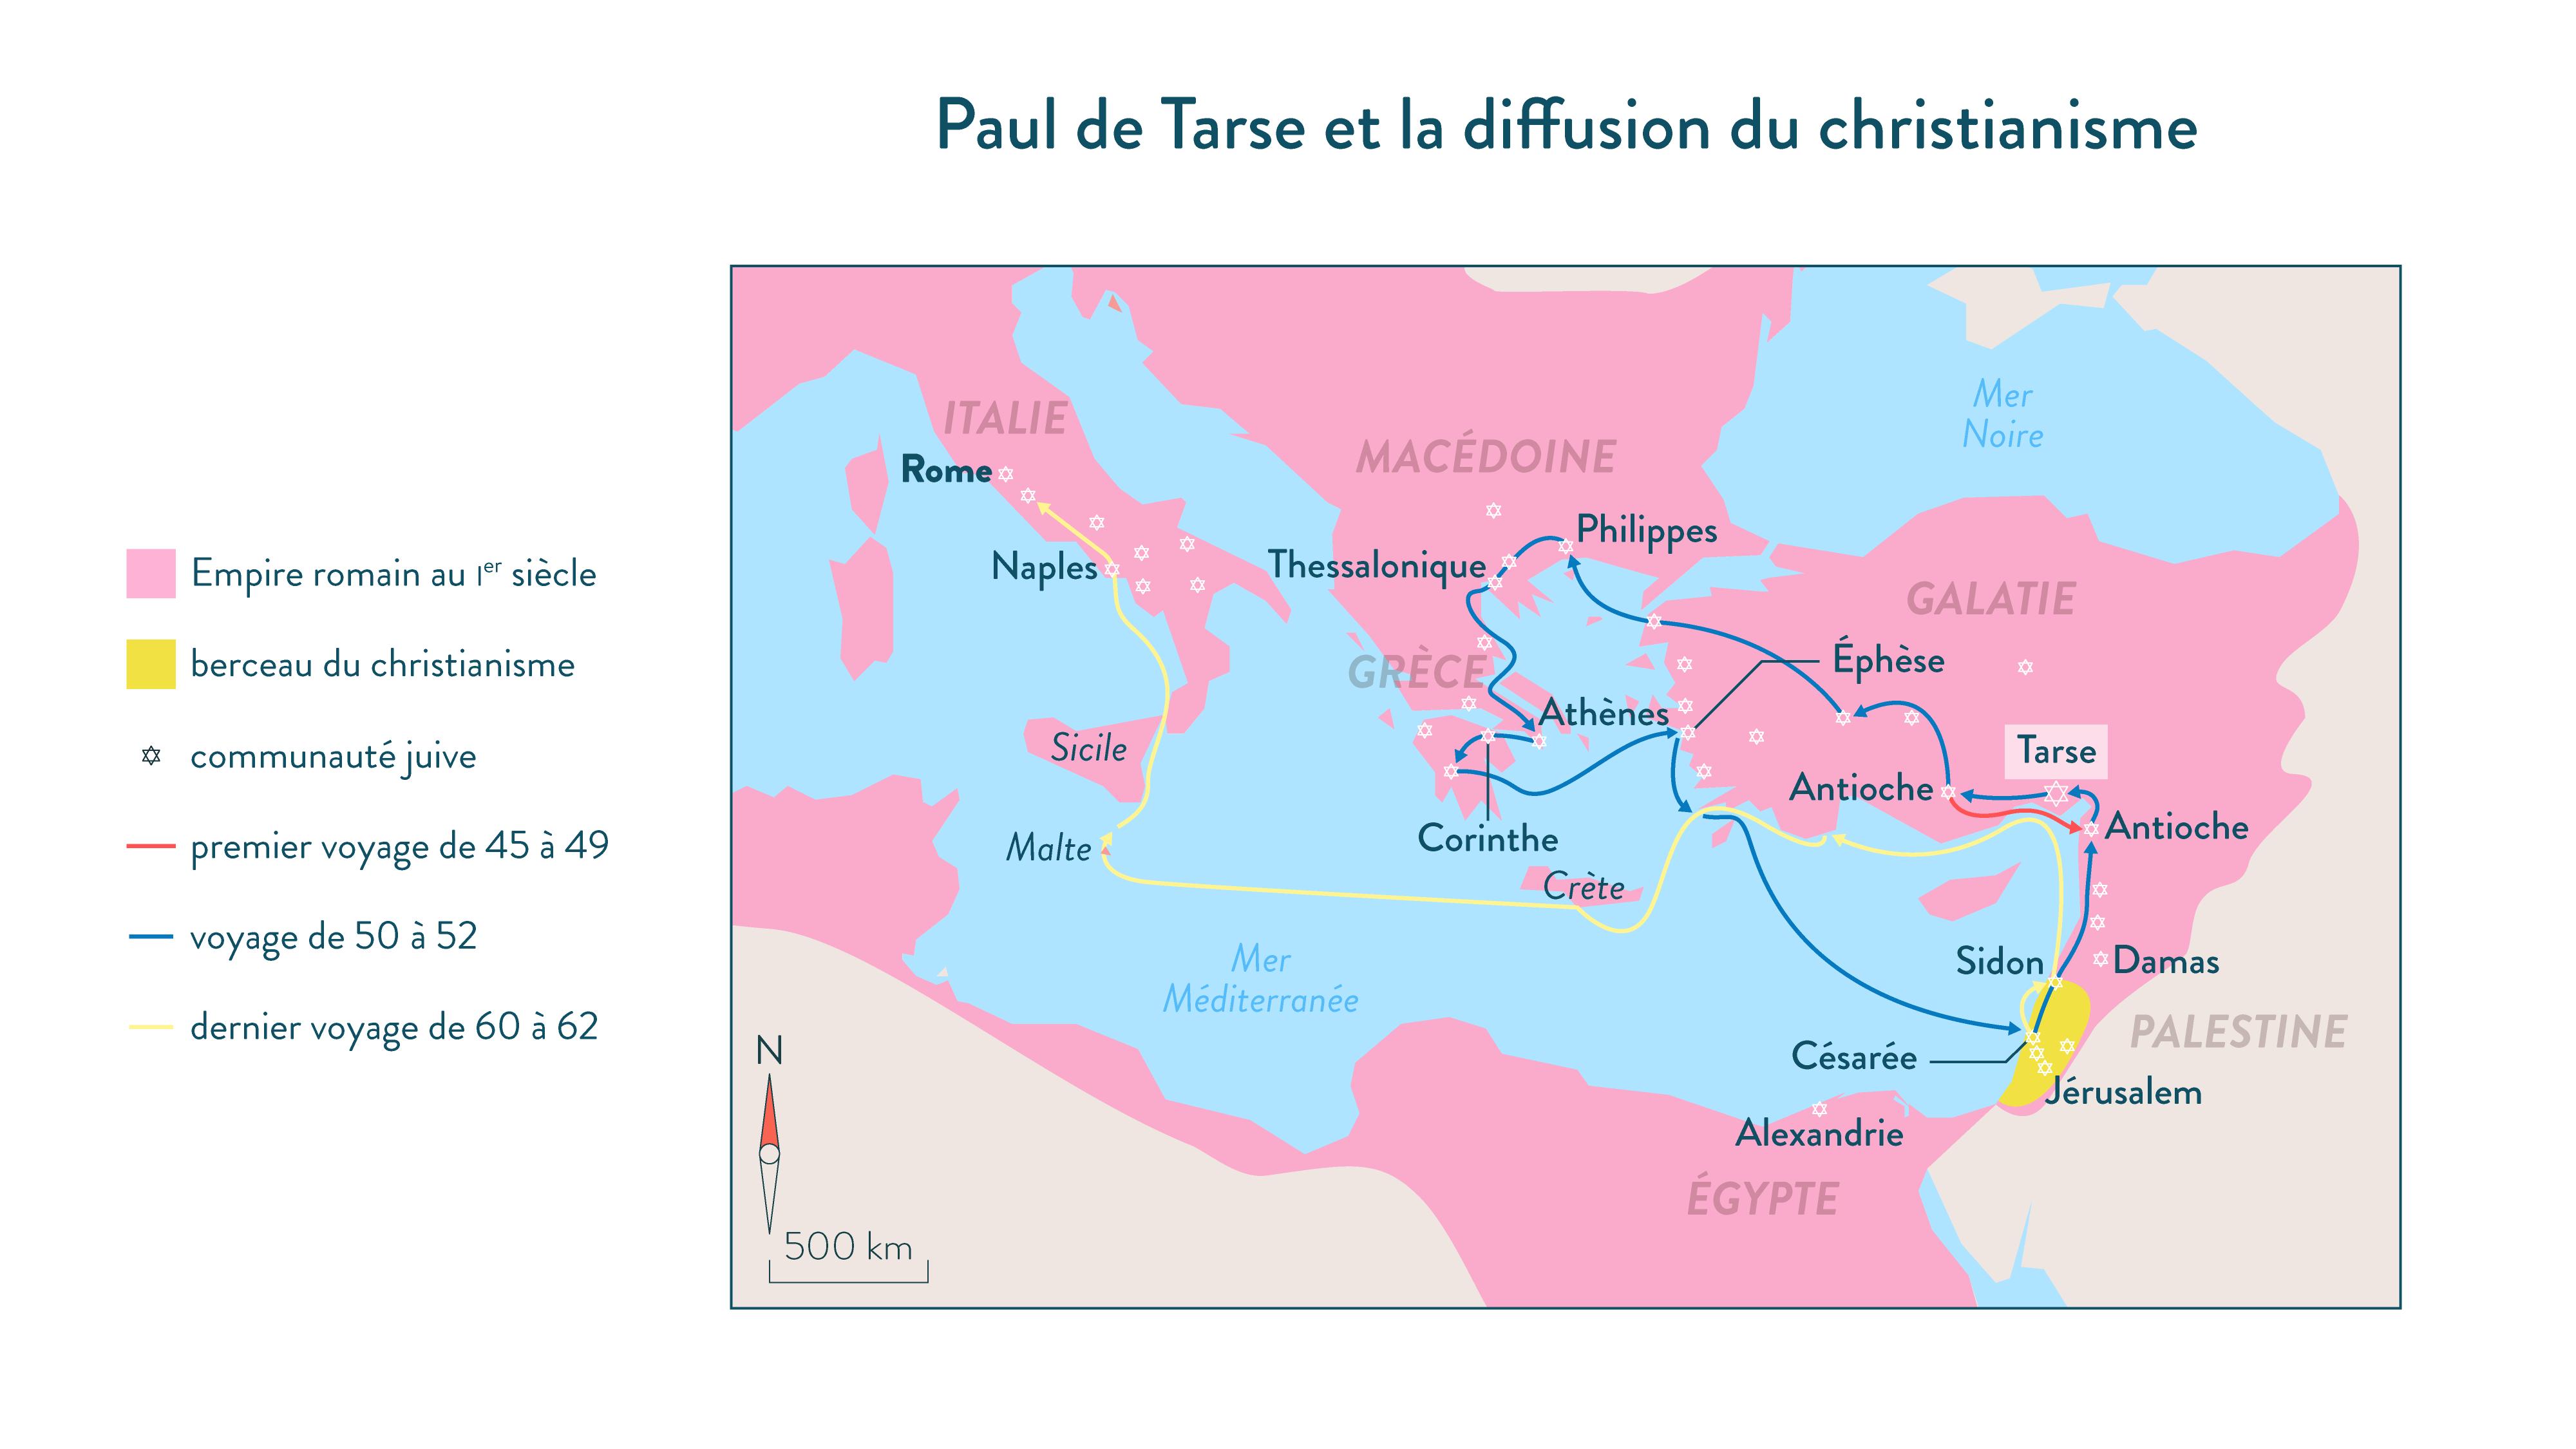 Paul de Tarse et la diffusion du christianisme-Histoire-6e